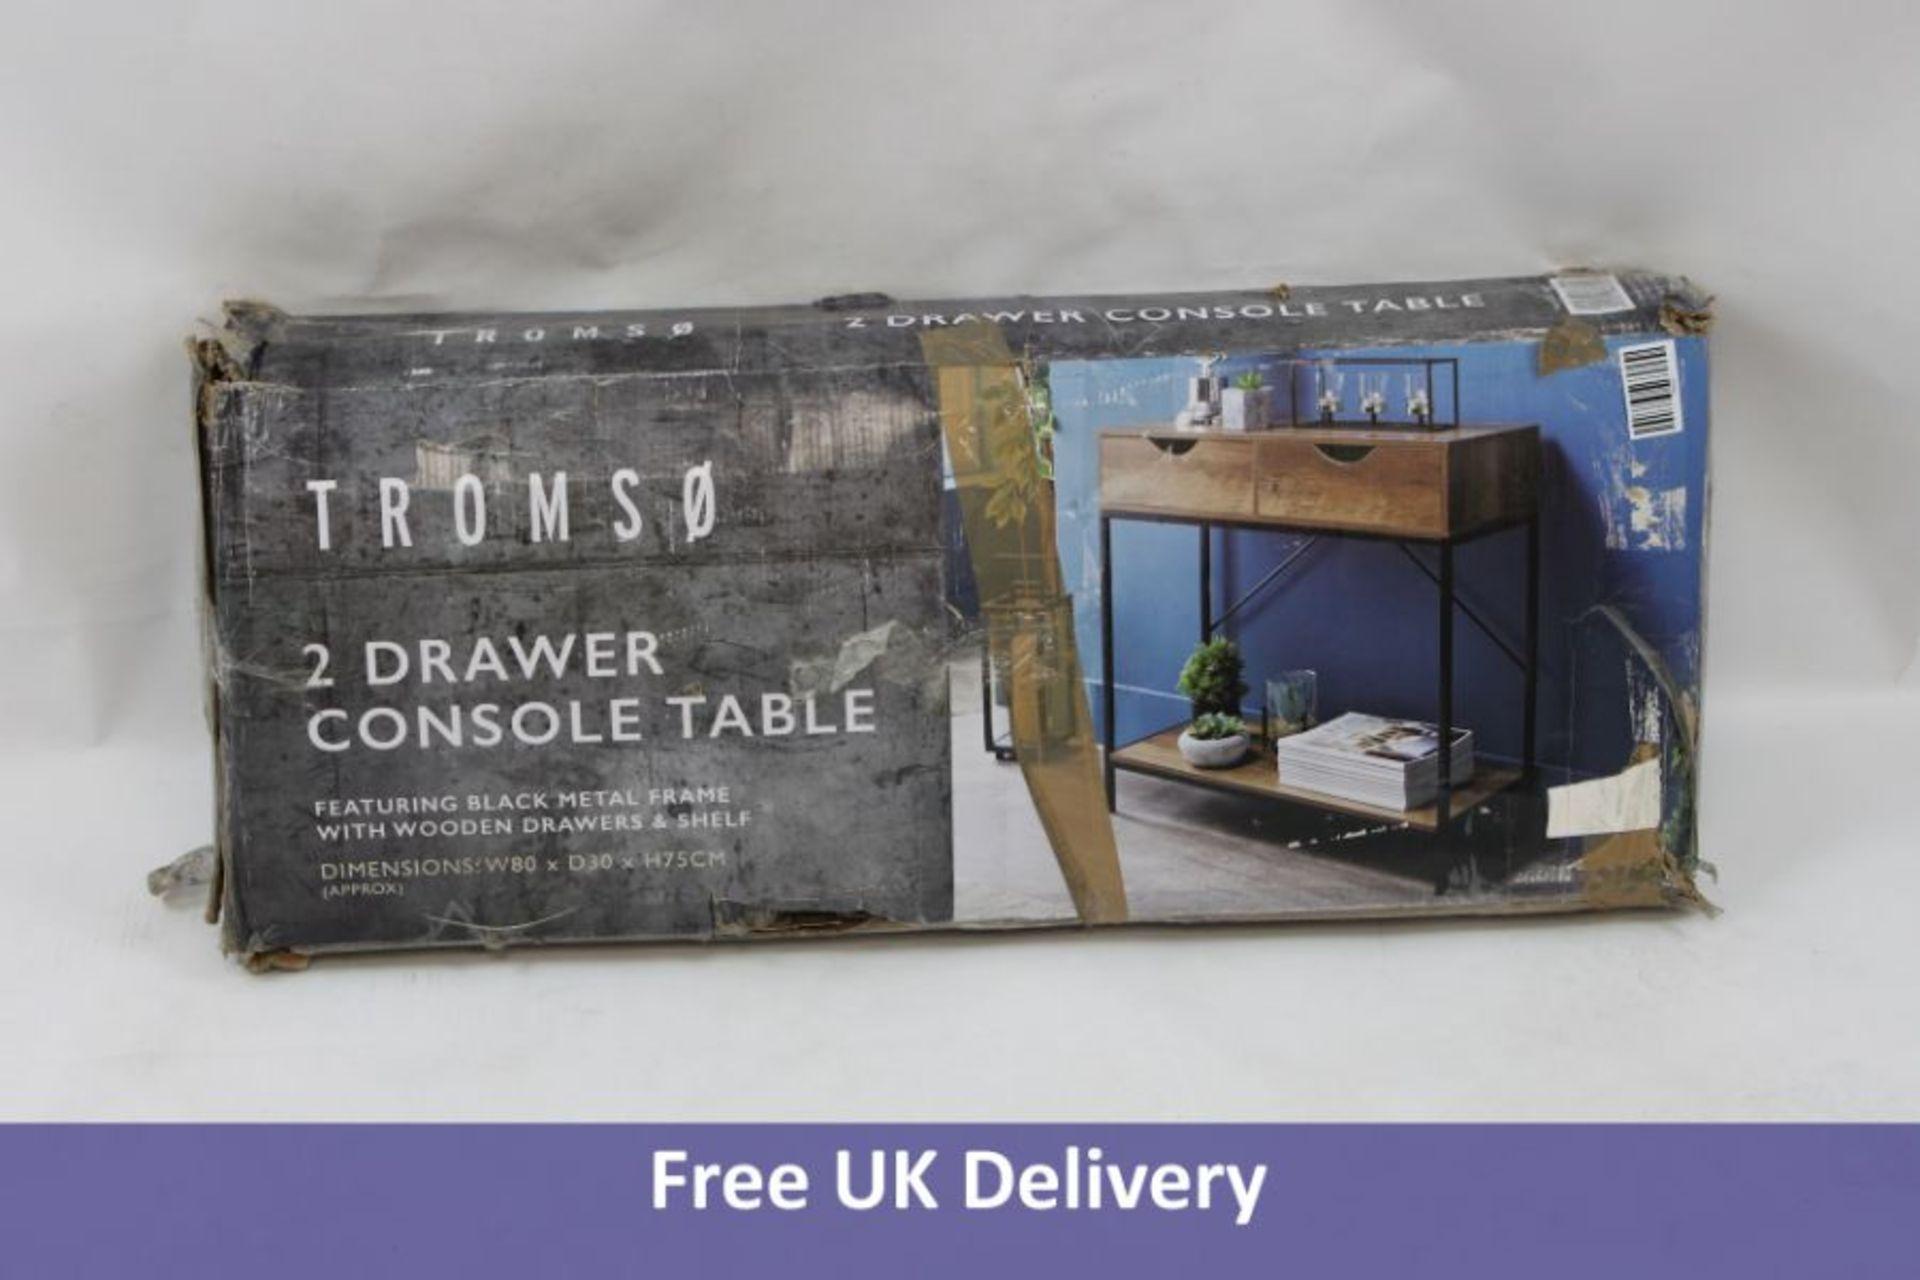 Tromso Console Table, Black Metal Frame. Box damaged